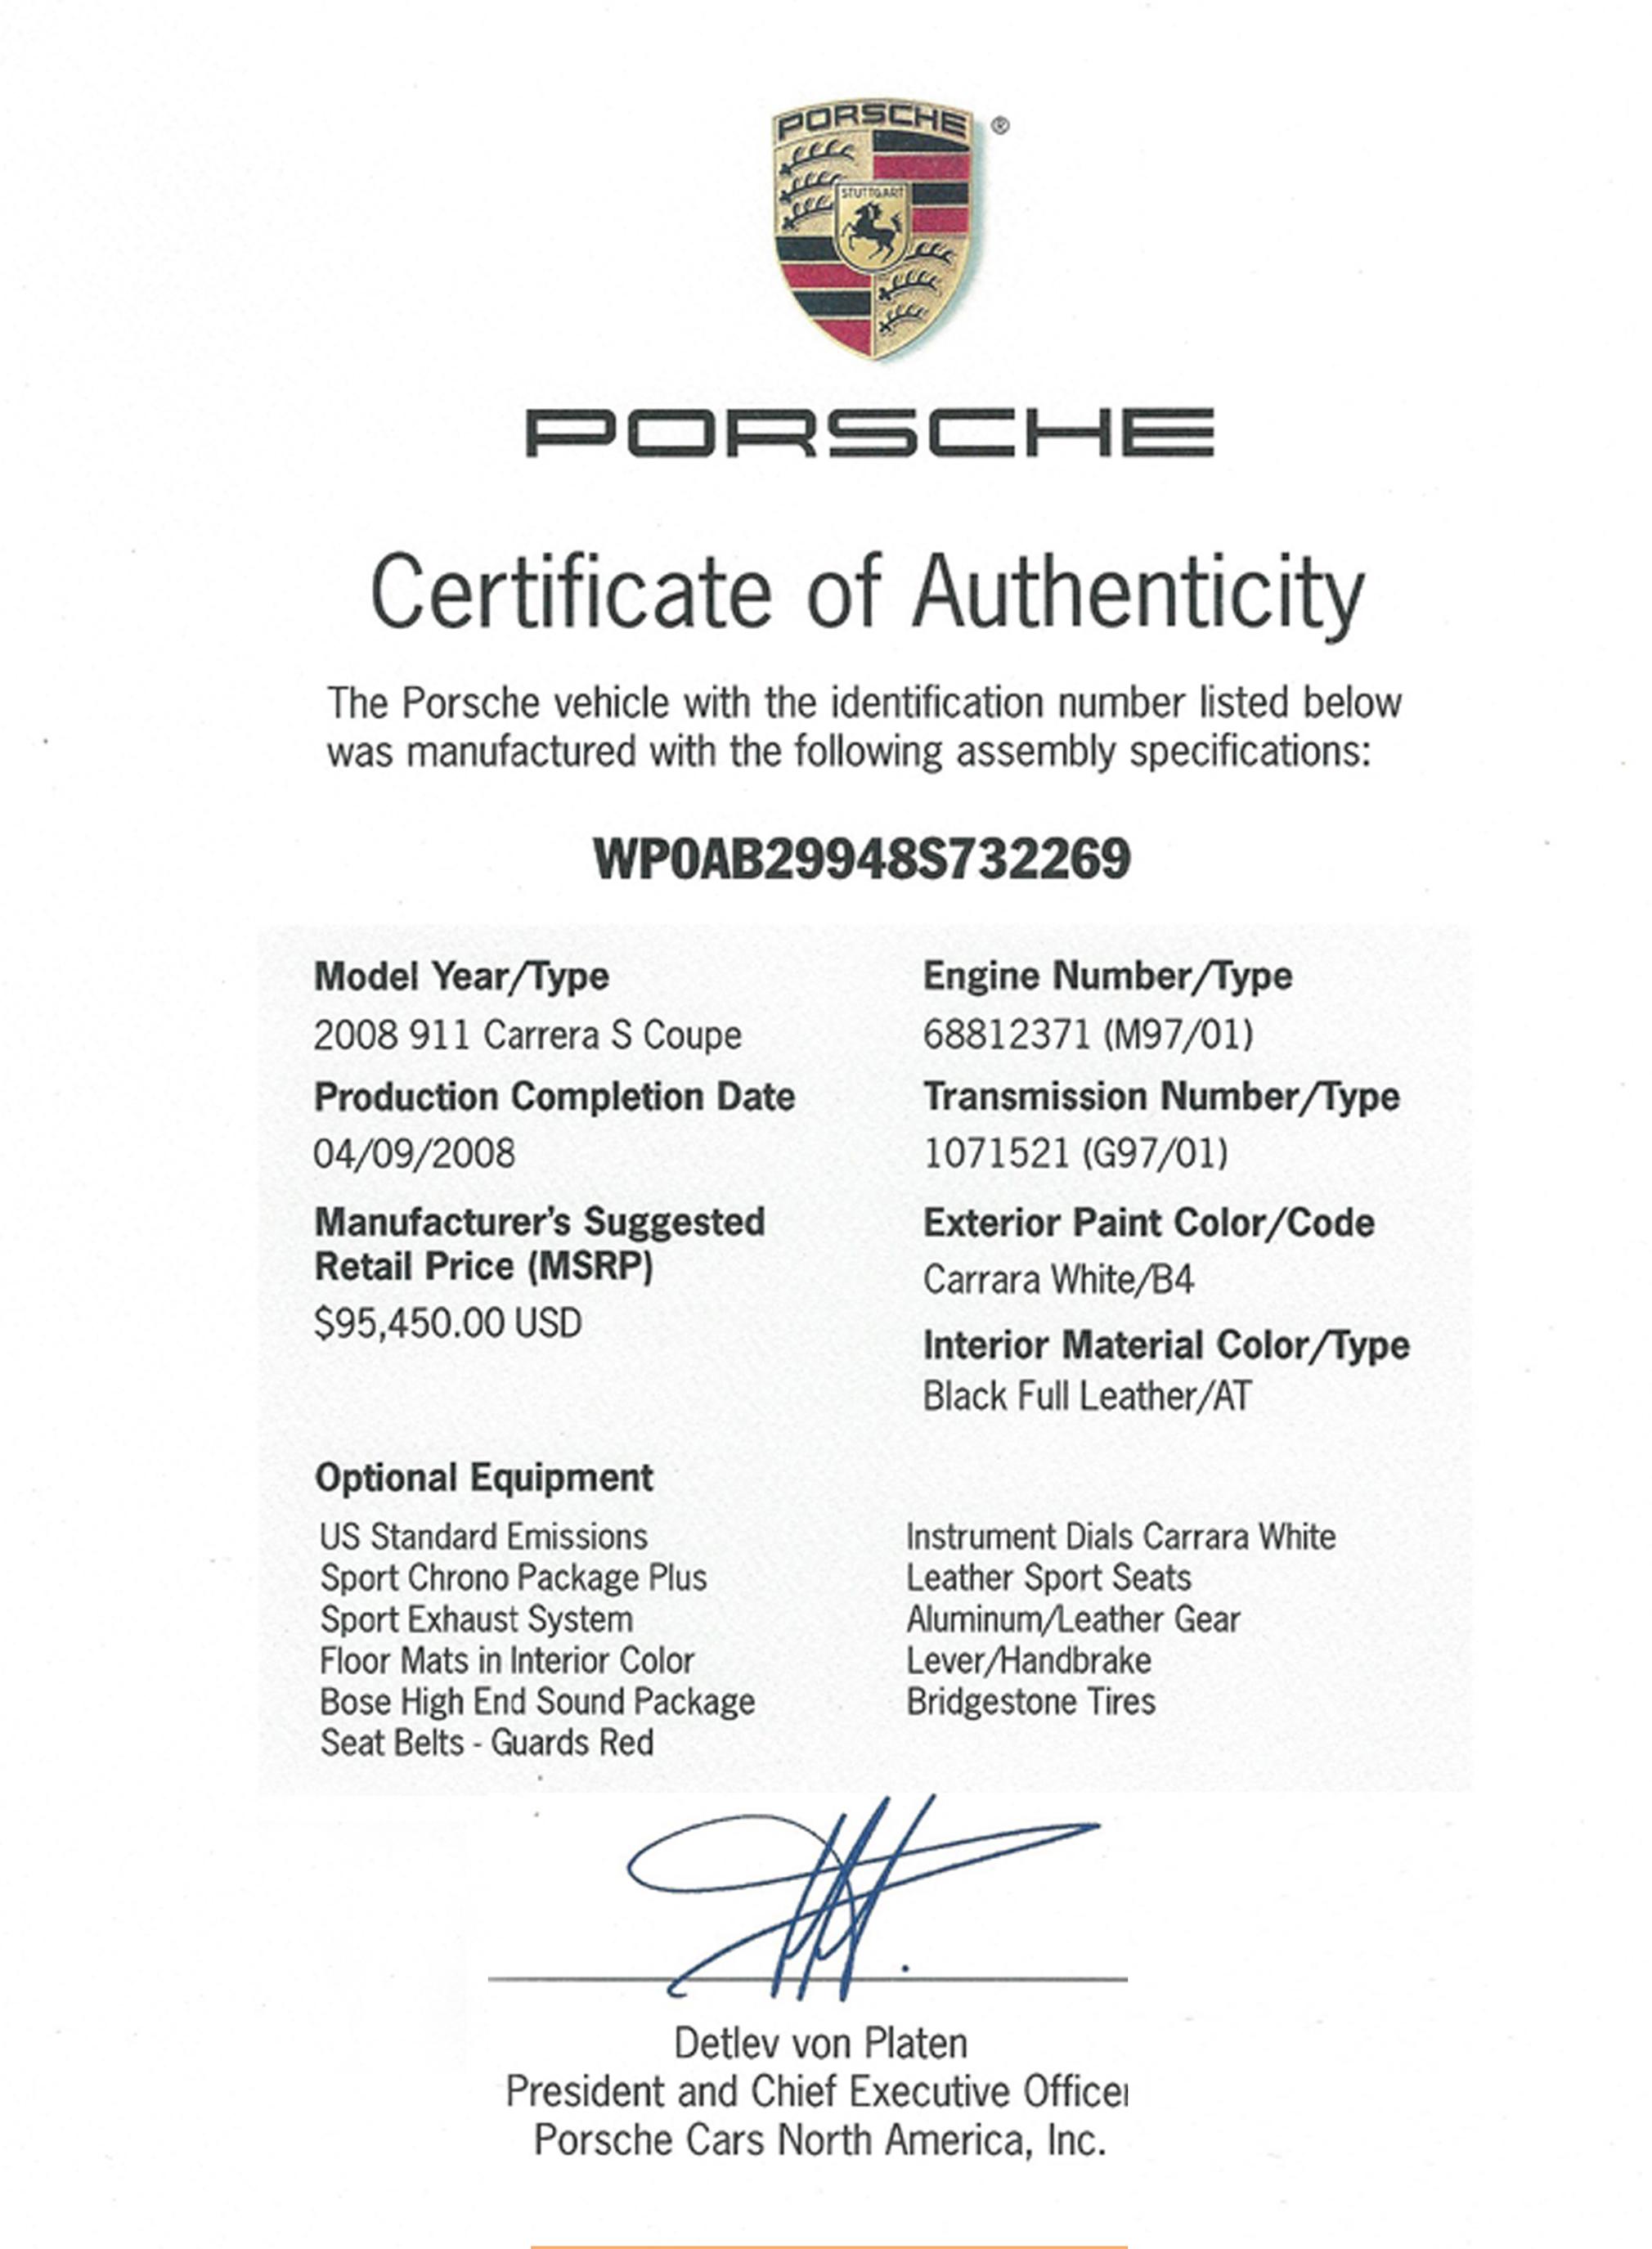 2008 911 Carrera S | Porsche Club of America